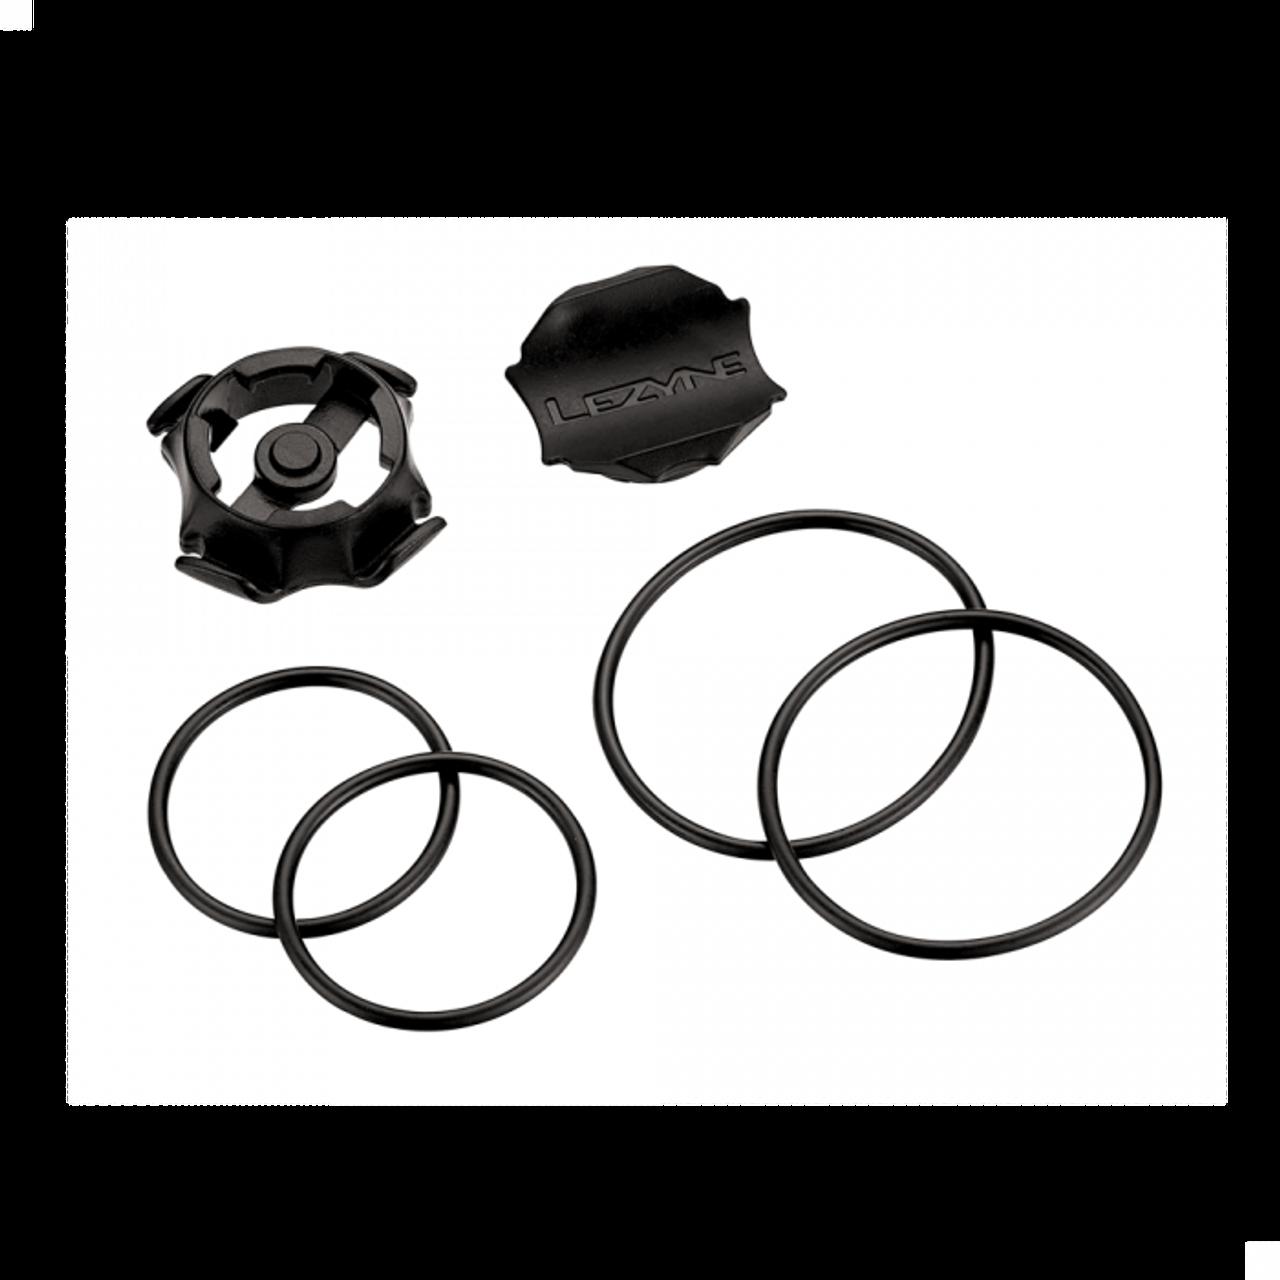 Lezyne GPS O-Ring Mount Kit In Black